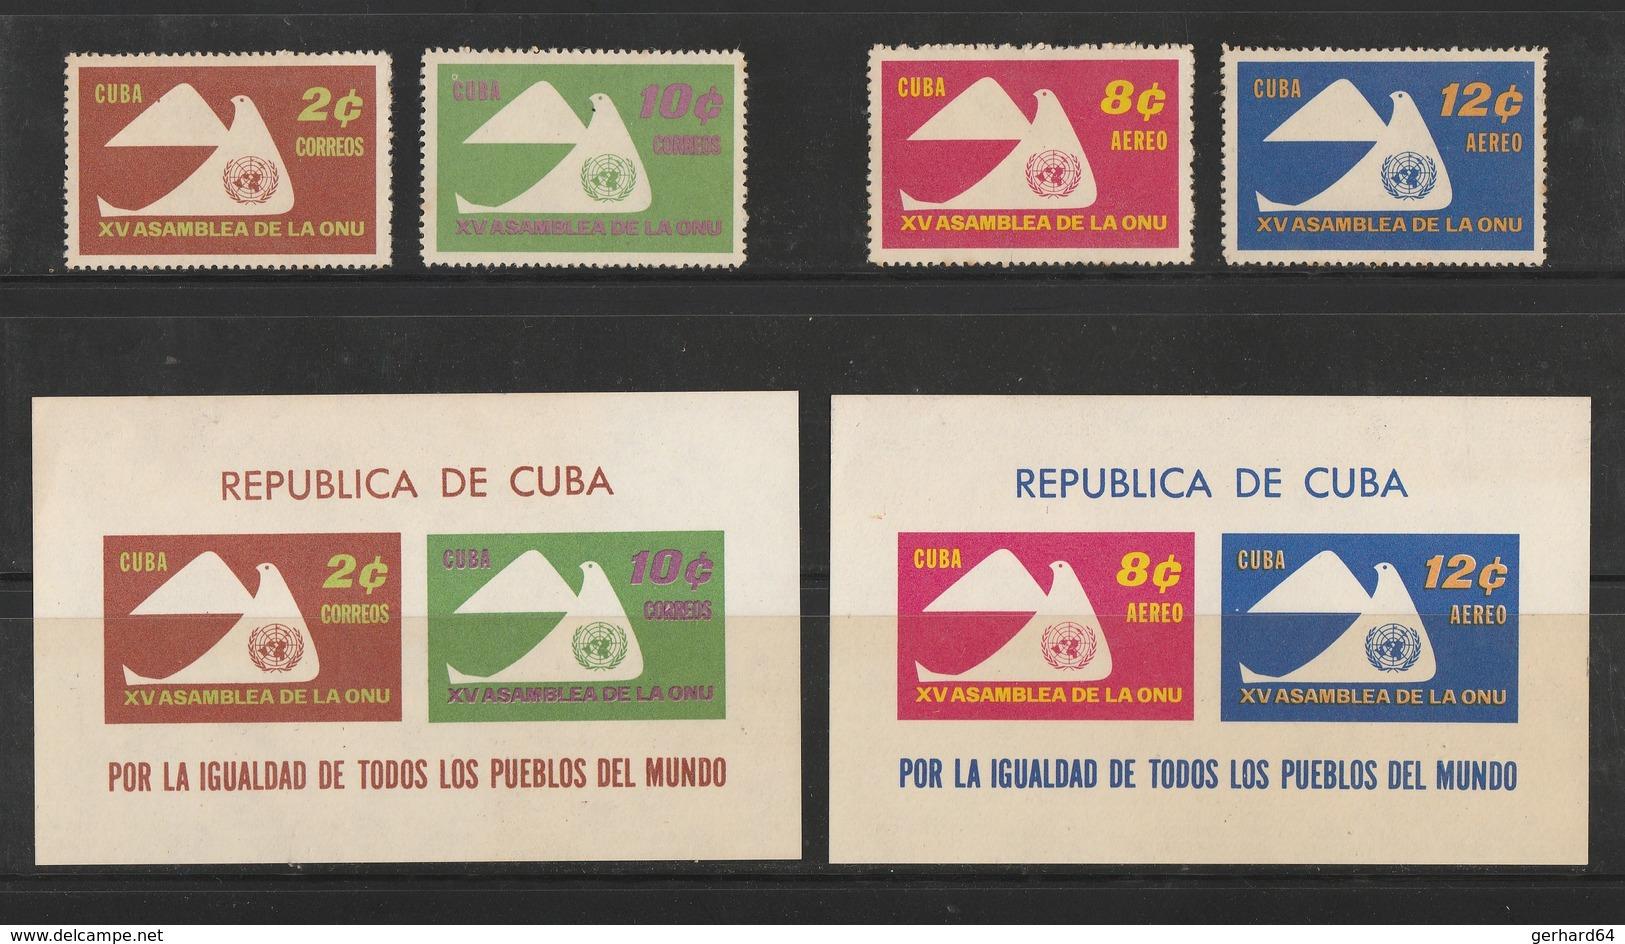 CUBA 1961 - N° Yvert > Poste 554-555 + PA 230-231 + Blocs 19-20 - Neufs** - Cuba